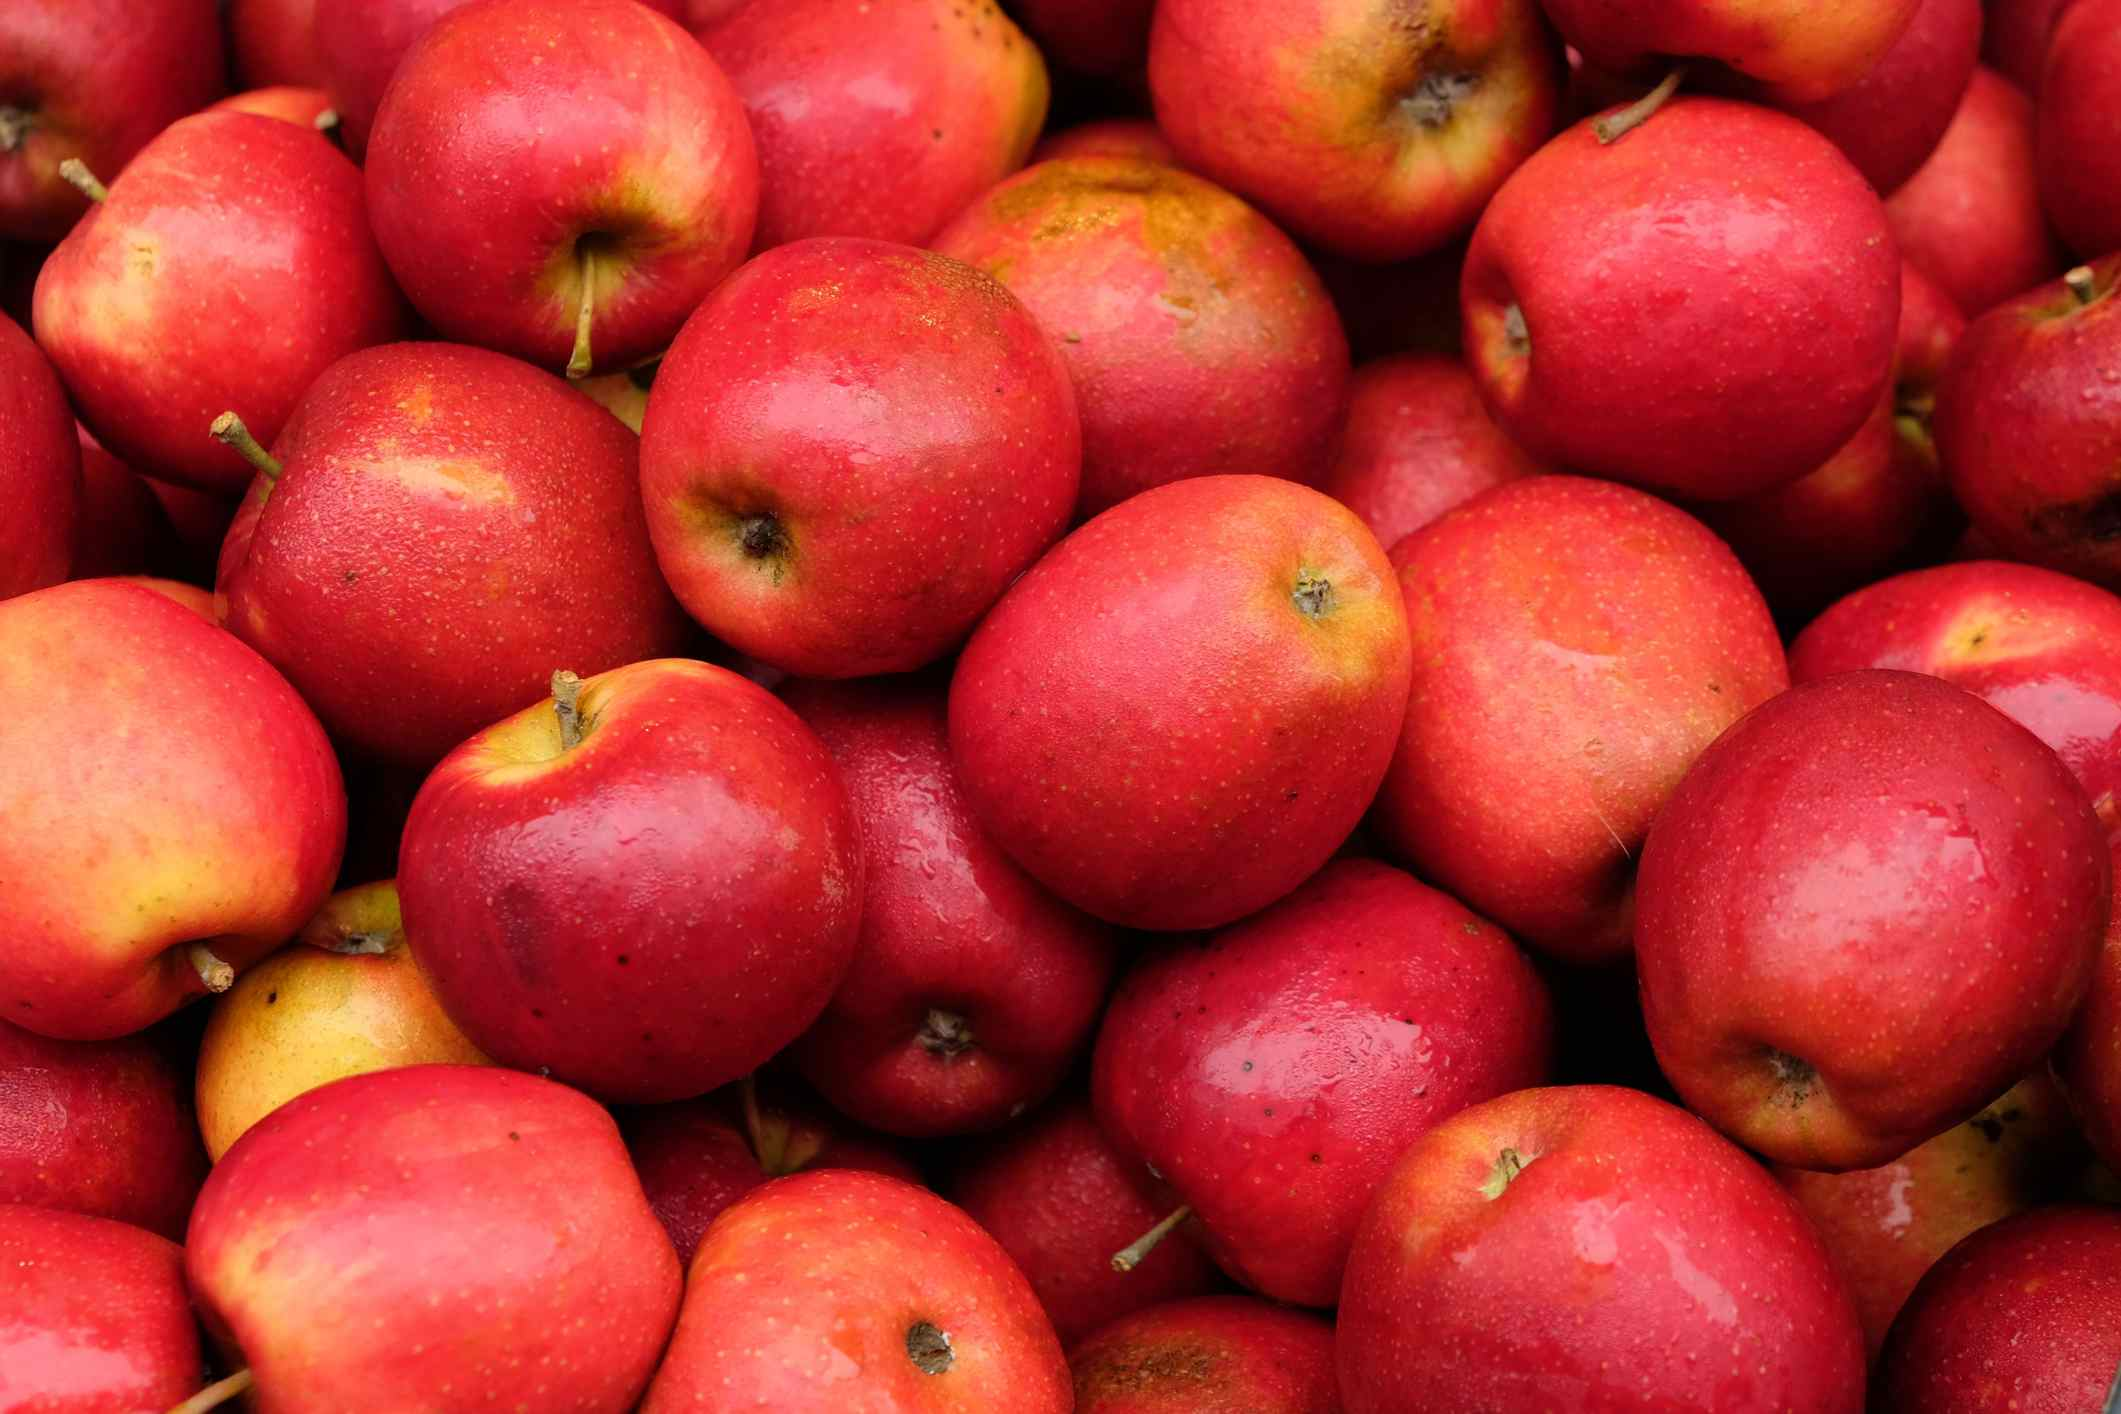 Elija sus propias manzanas en Julian, California